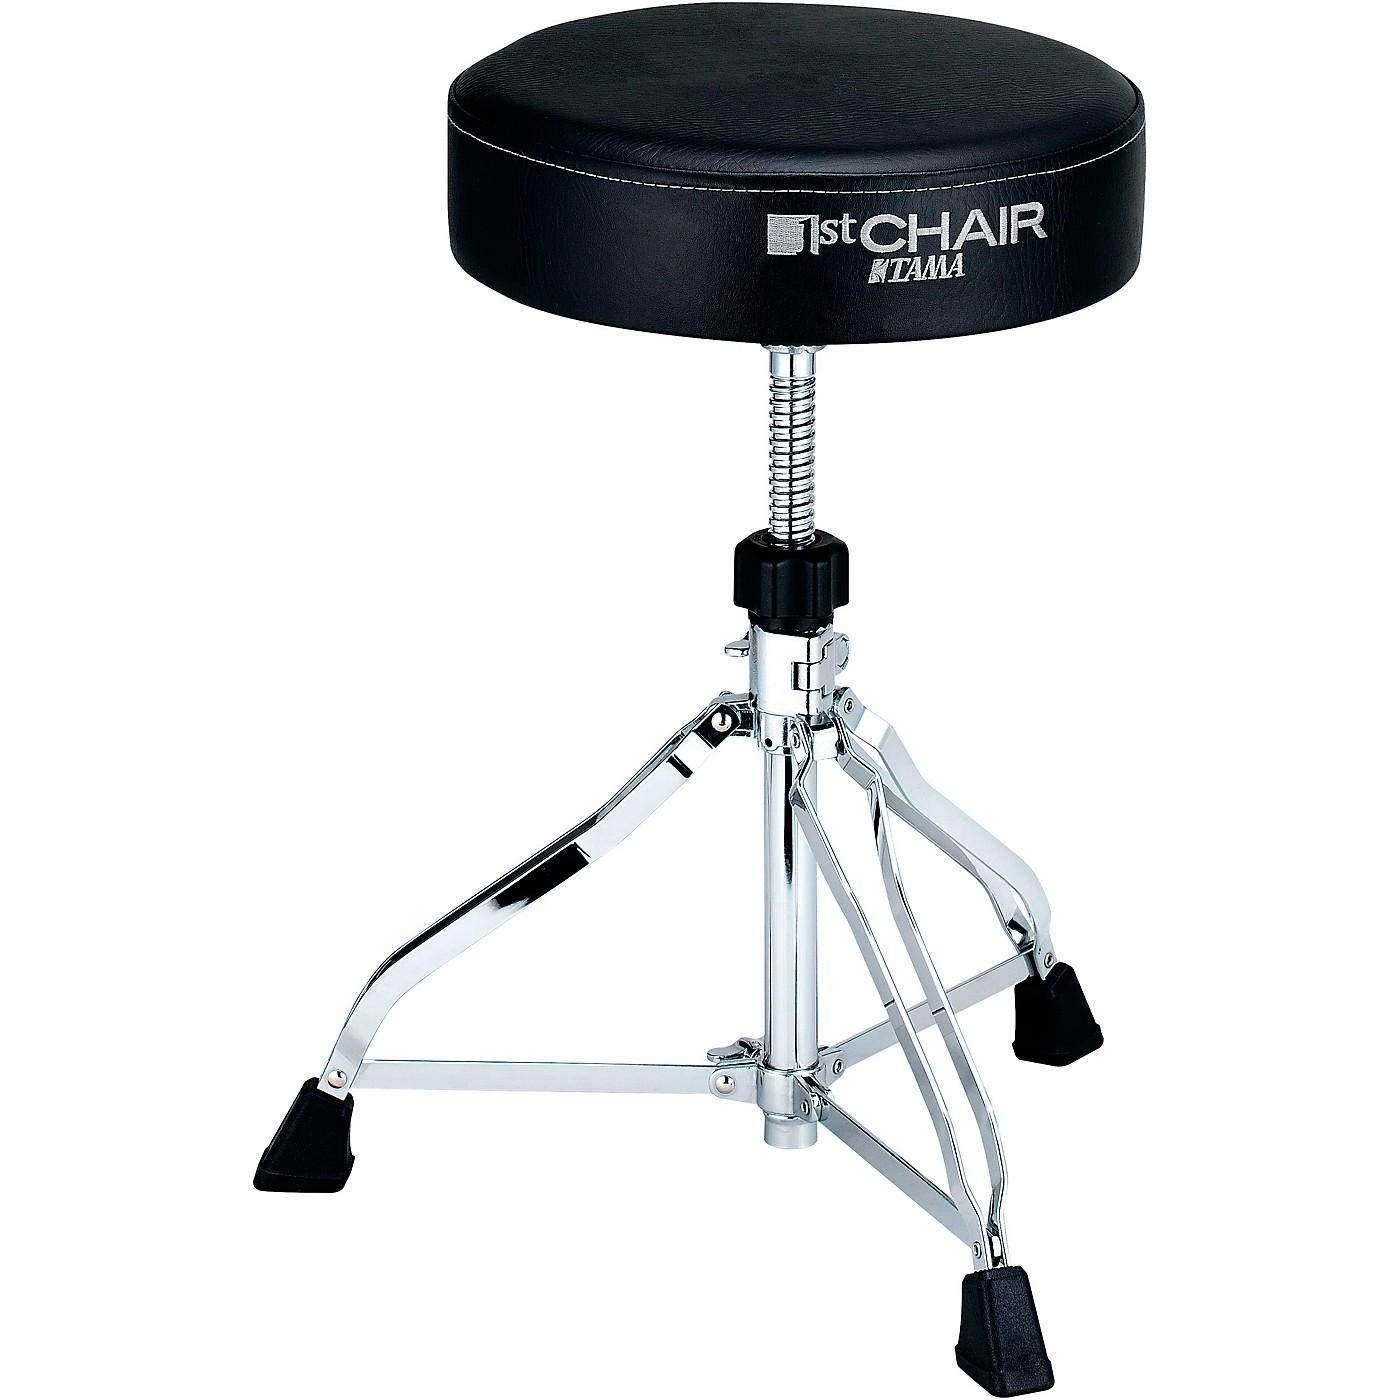 TAMA 1st Chair Round Drum Throne thumbnail